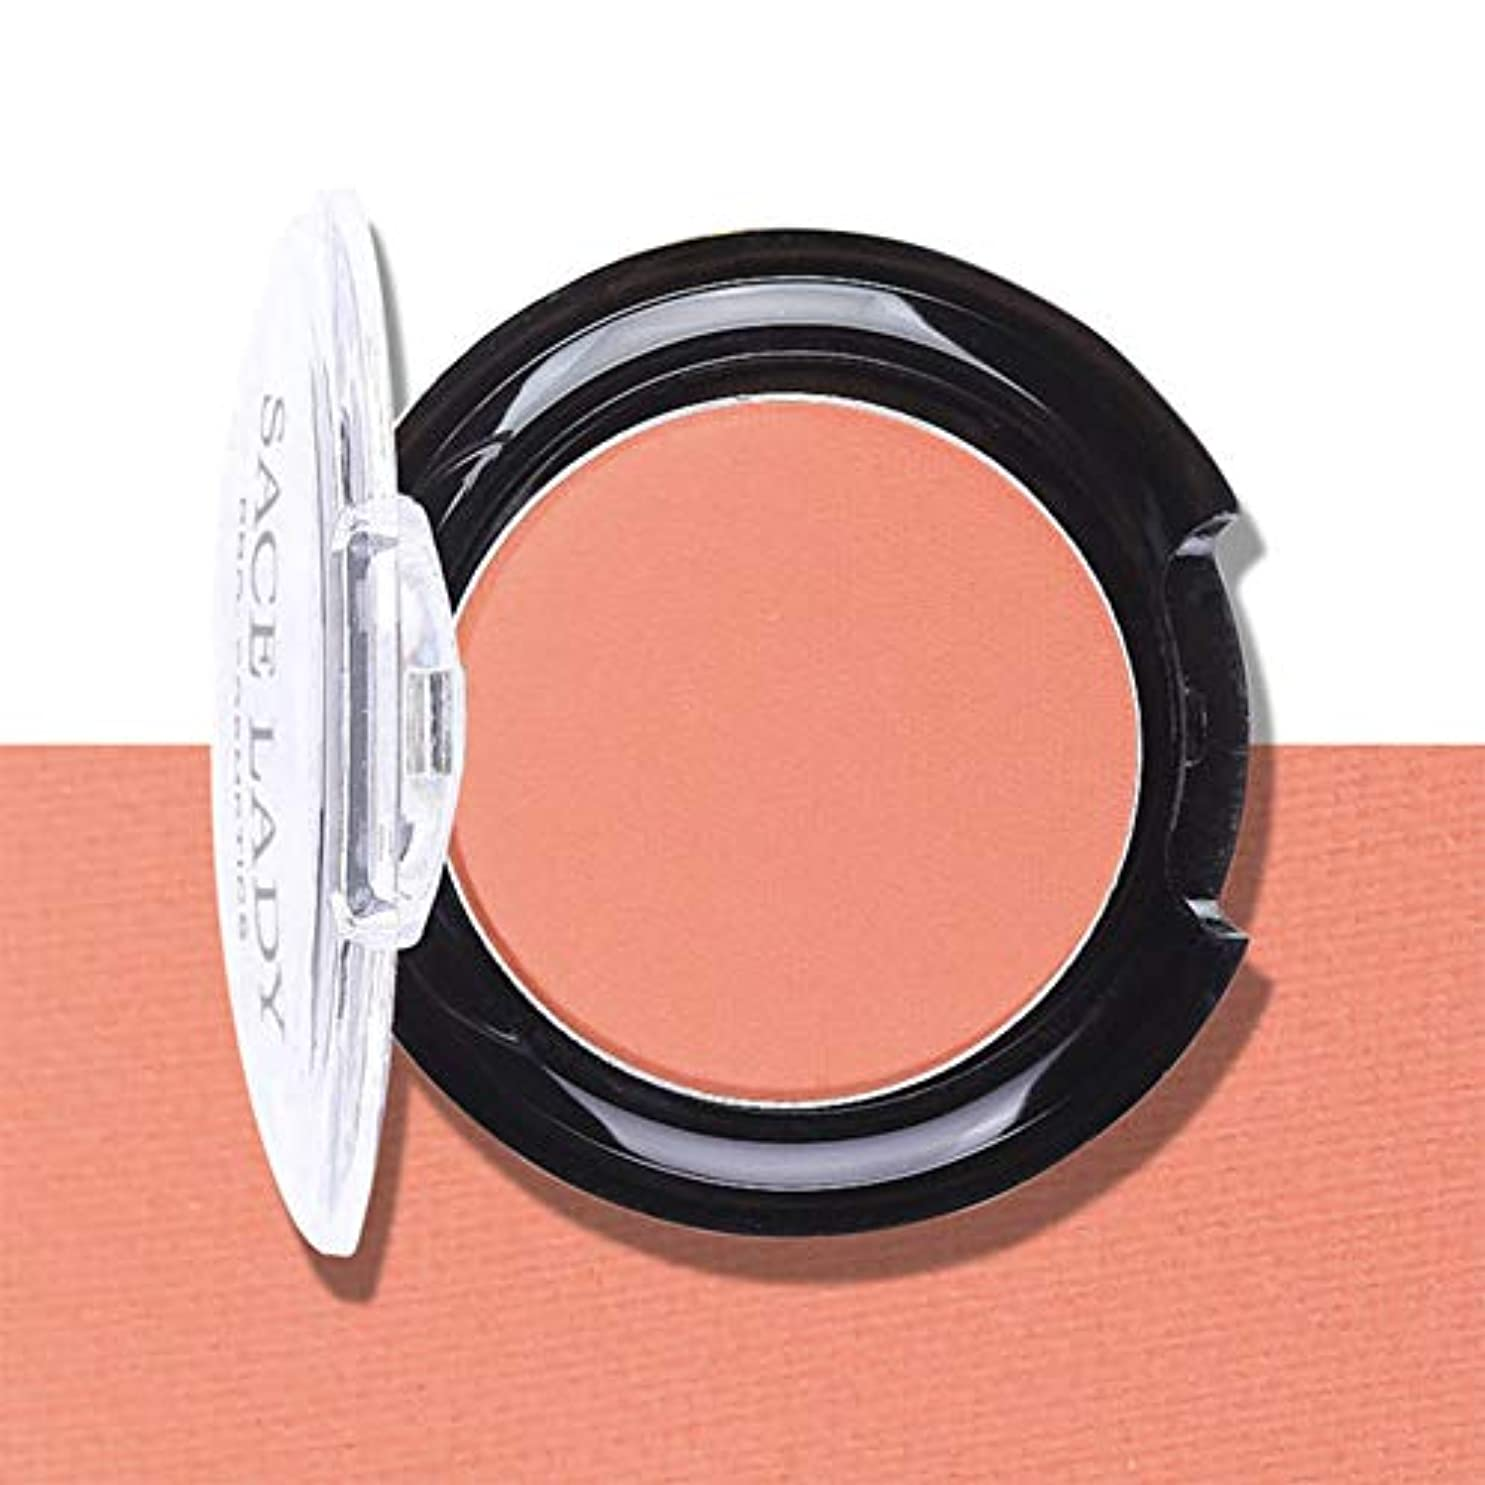 Rabugogo マットアイシャドーパレット防水プロフェッショナルアイシャドー顔料ナチュラル長持ち化粧品 36